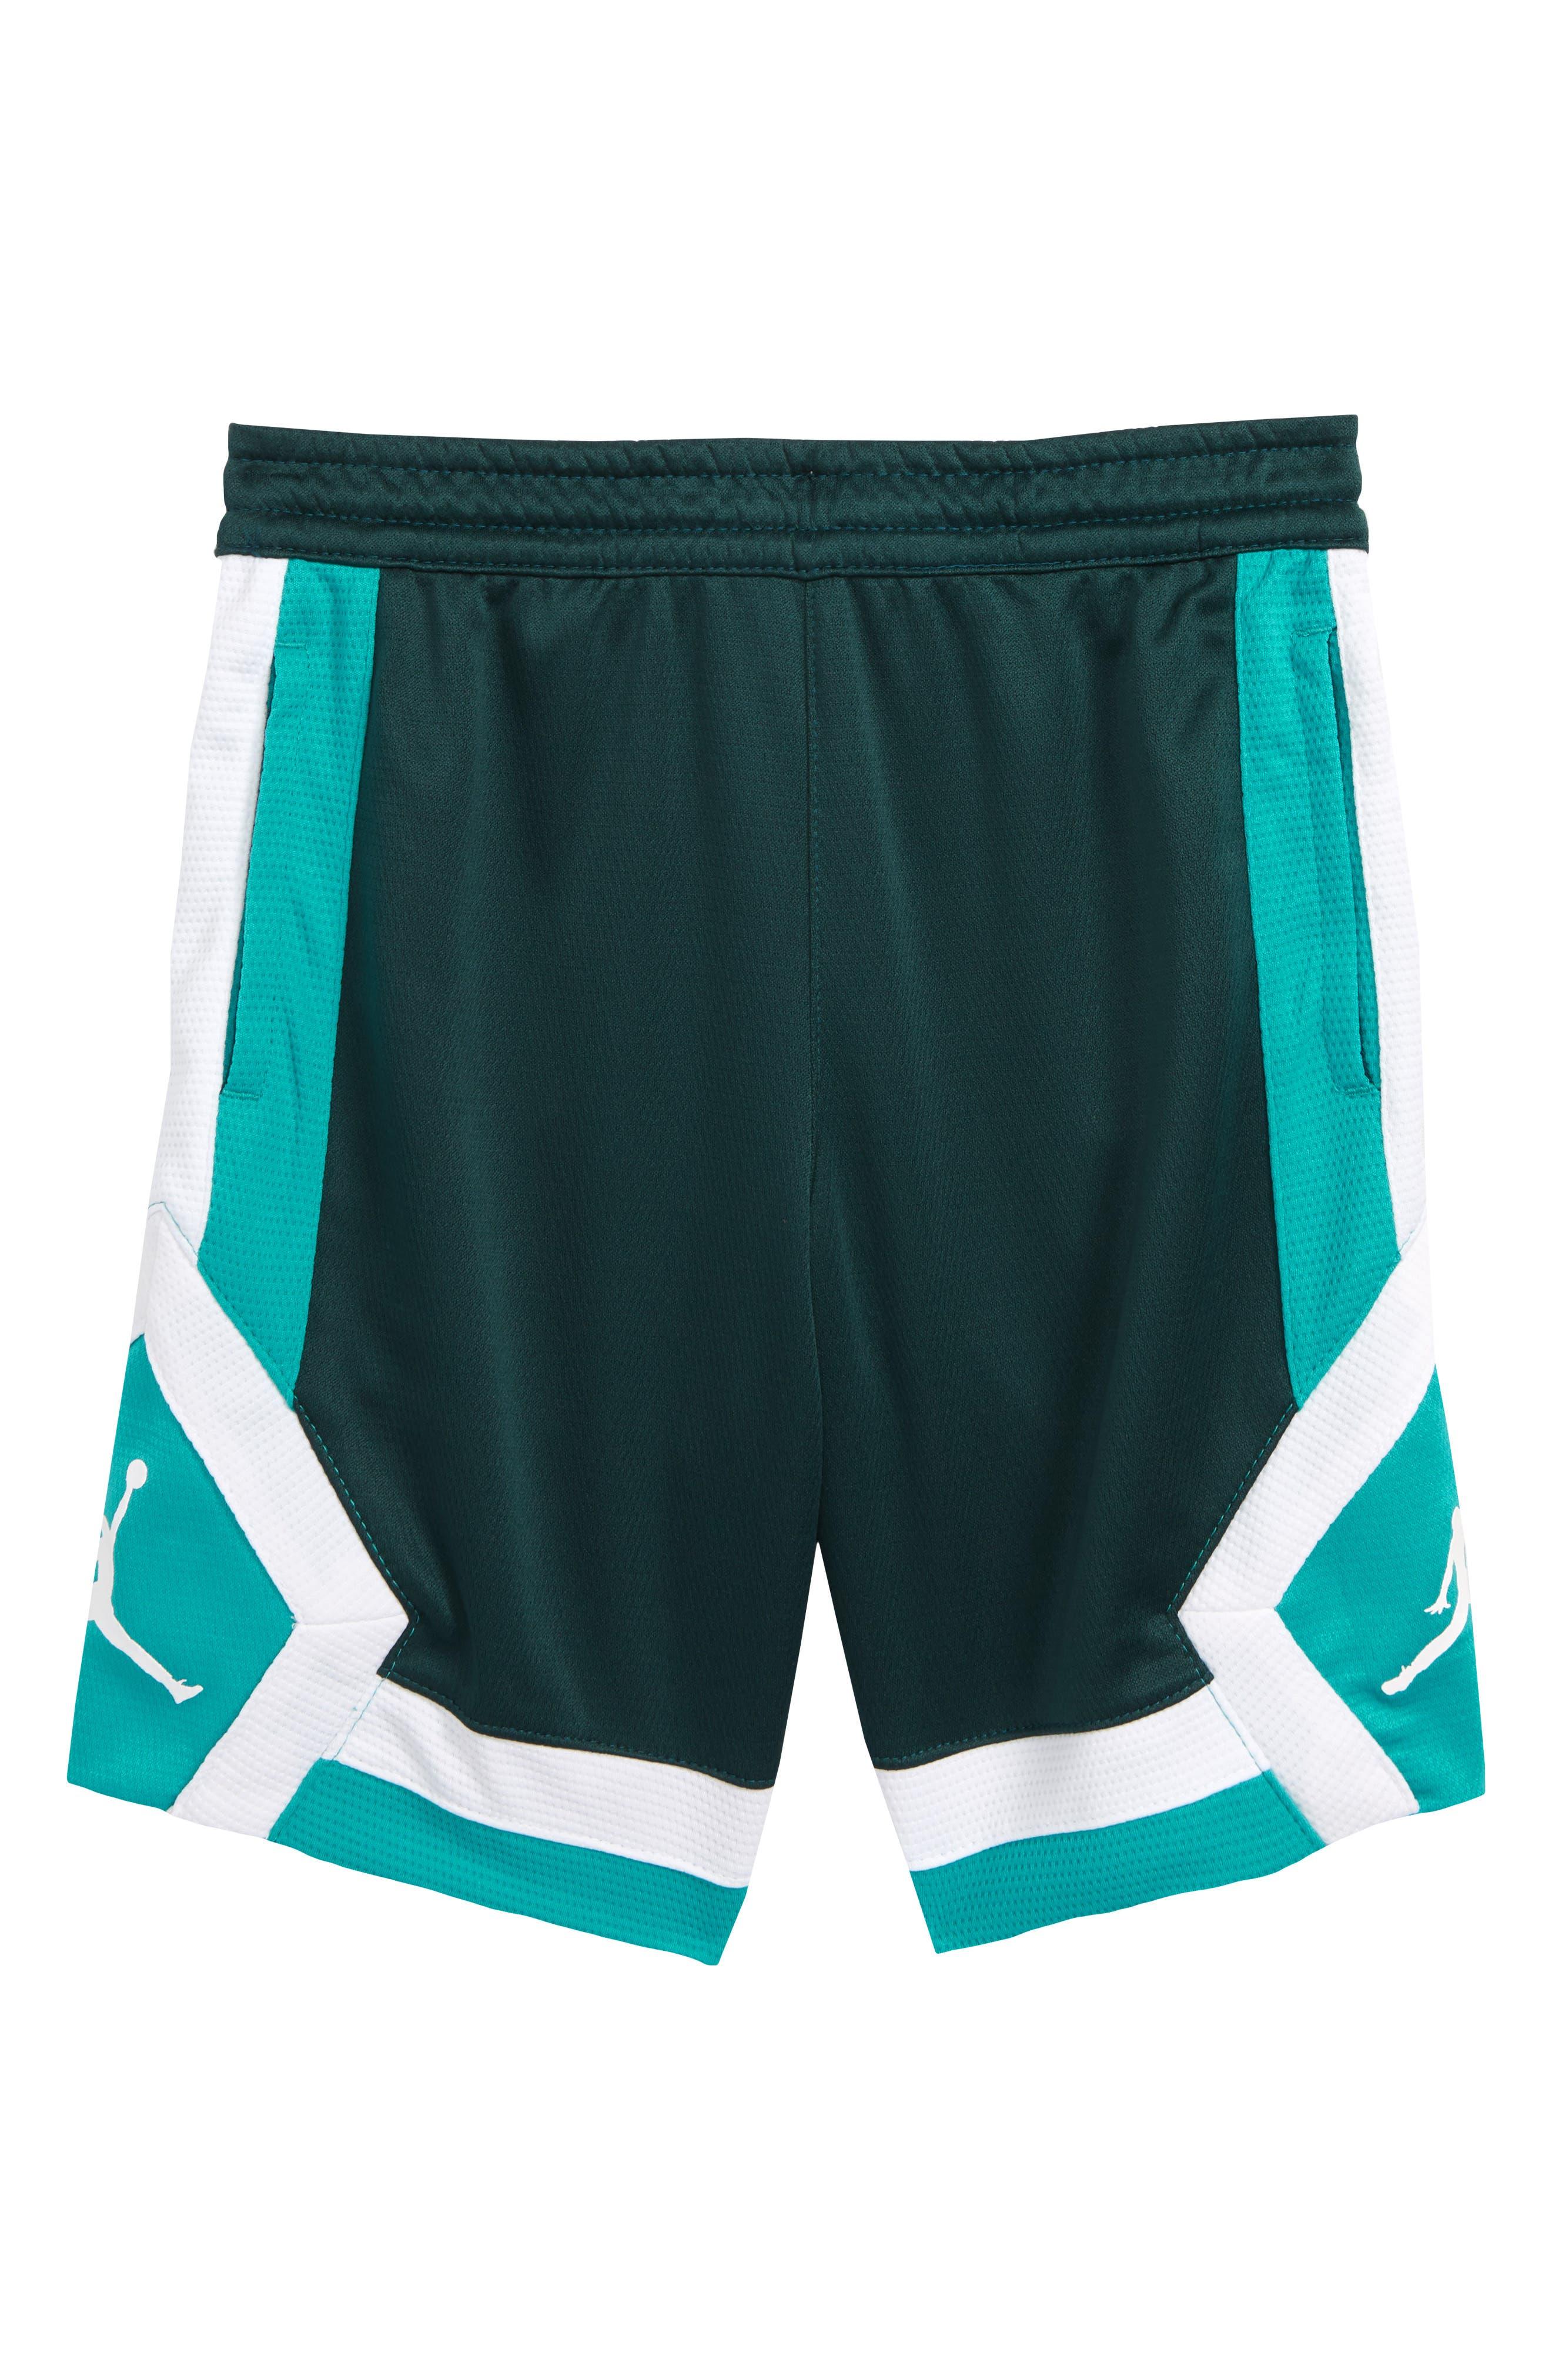 Jordan Rise Athletic Shorts,                         Main,                         color, MIDNIGHT SPRUCE